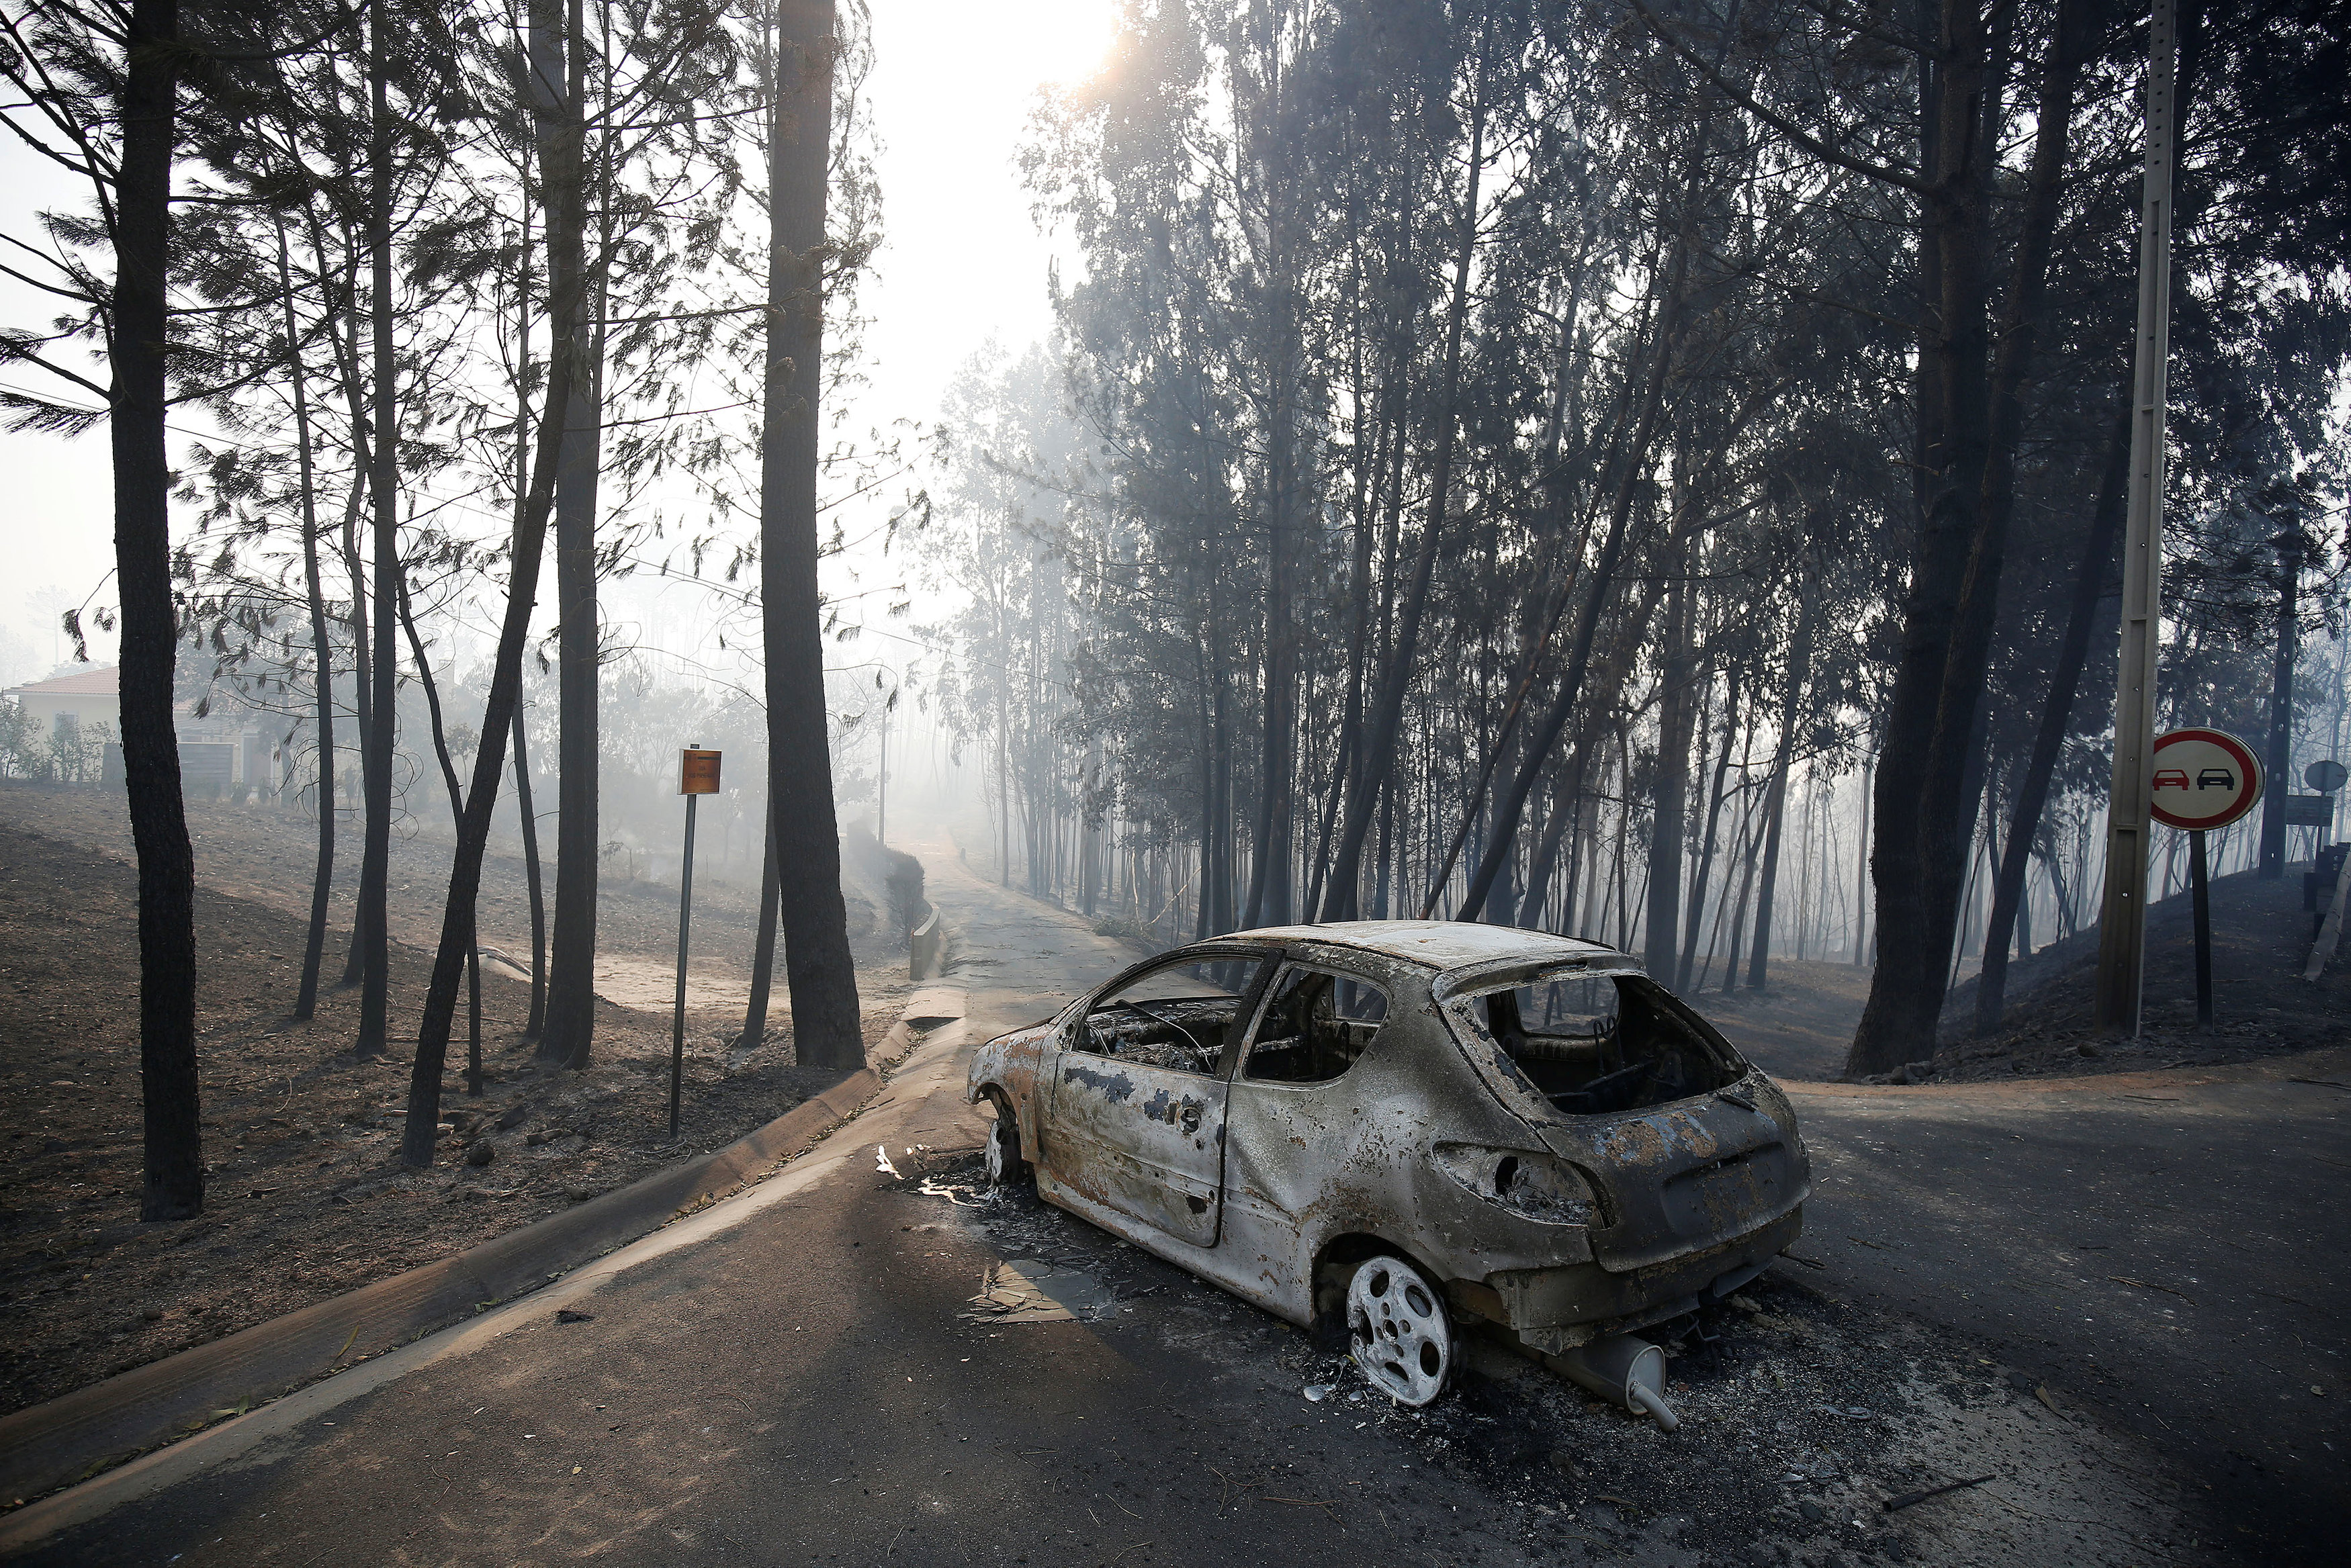 2017-06-18T094851Z 1845535484 RC1584764EA0 RTRMADP 3 PORTUGAL-FIRE